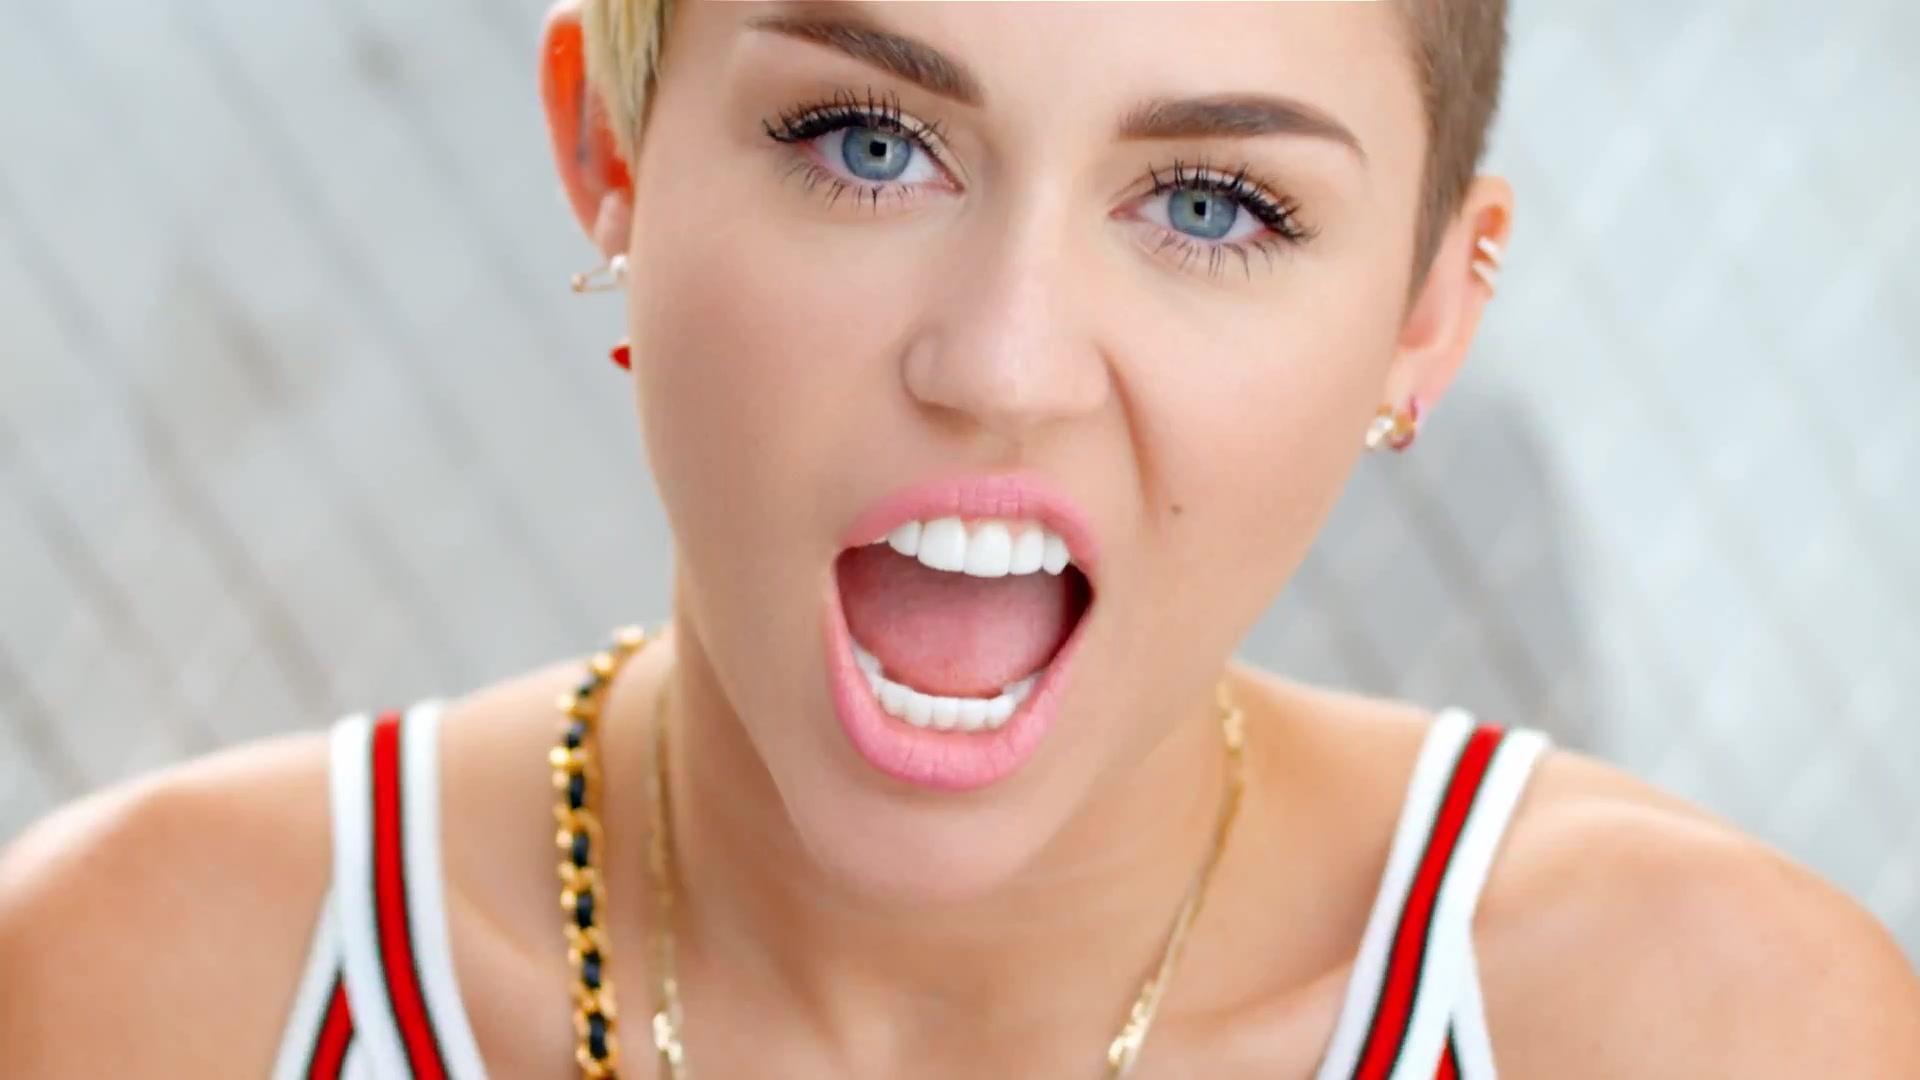 Bangerz HD Miley Cyrus Background